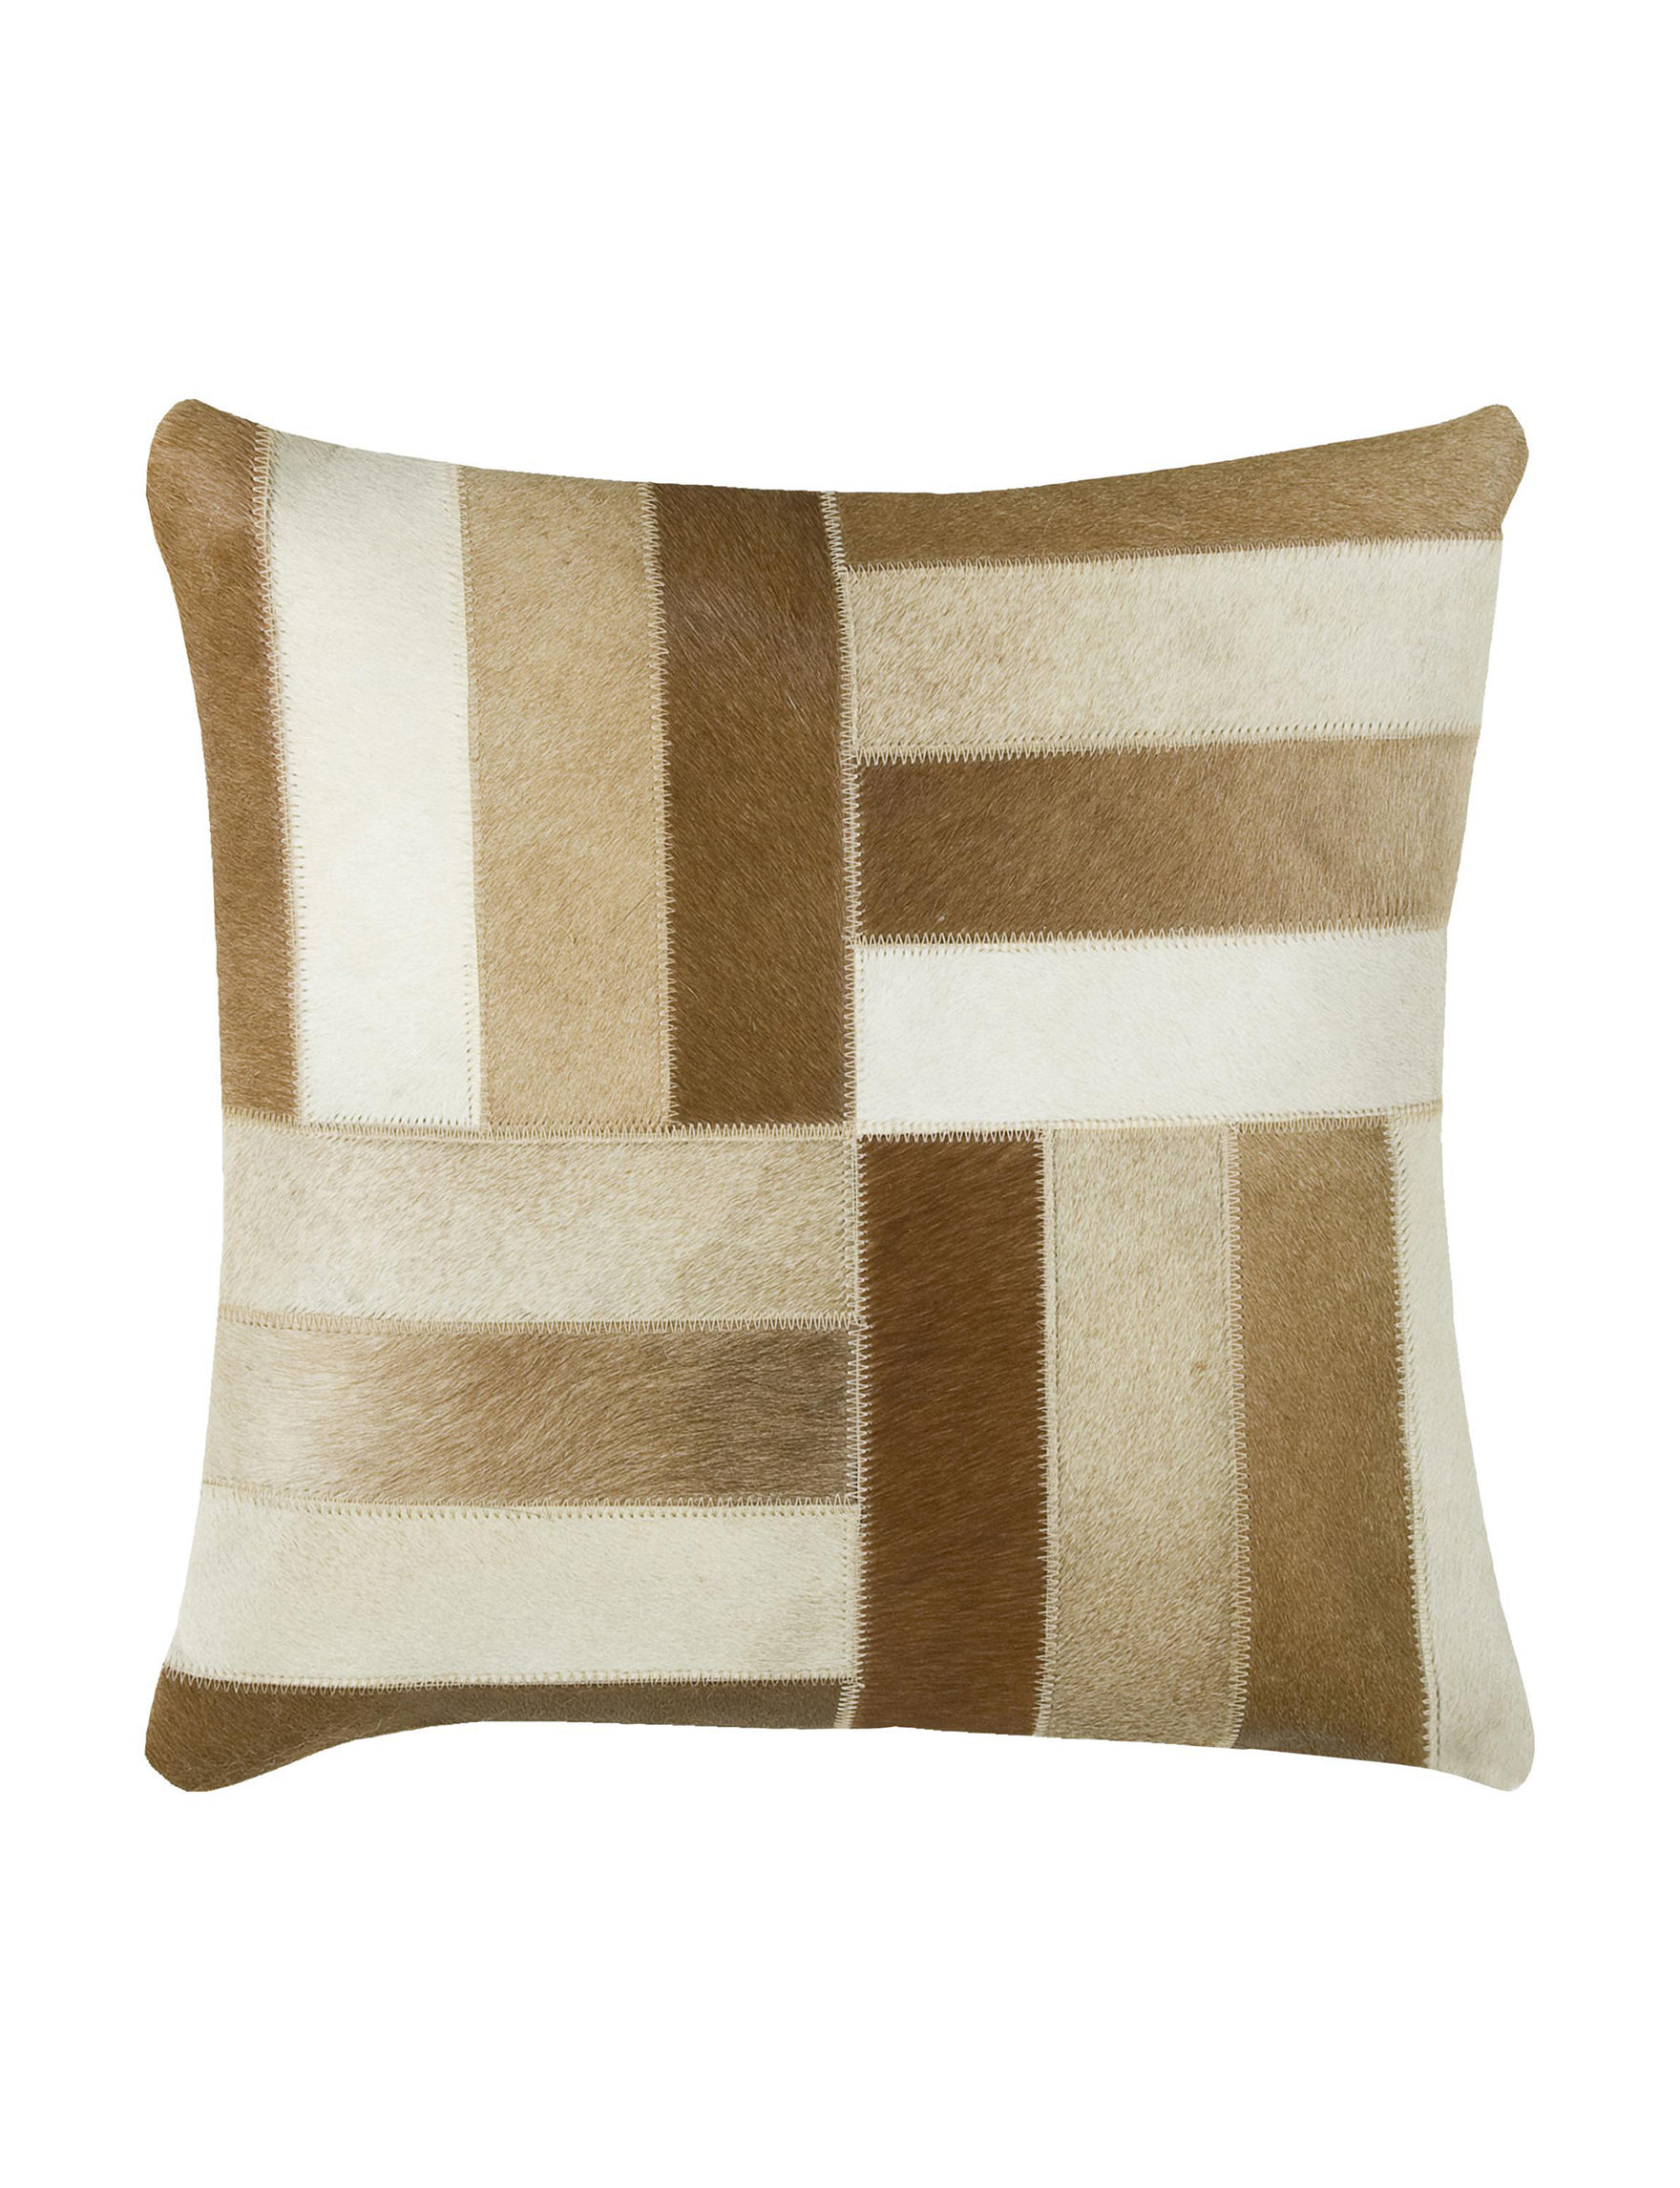 Rizzy Home khaki/brown Decorative Pillows